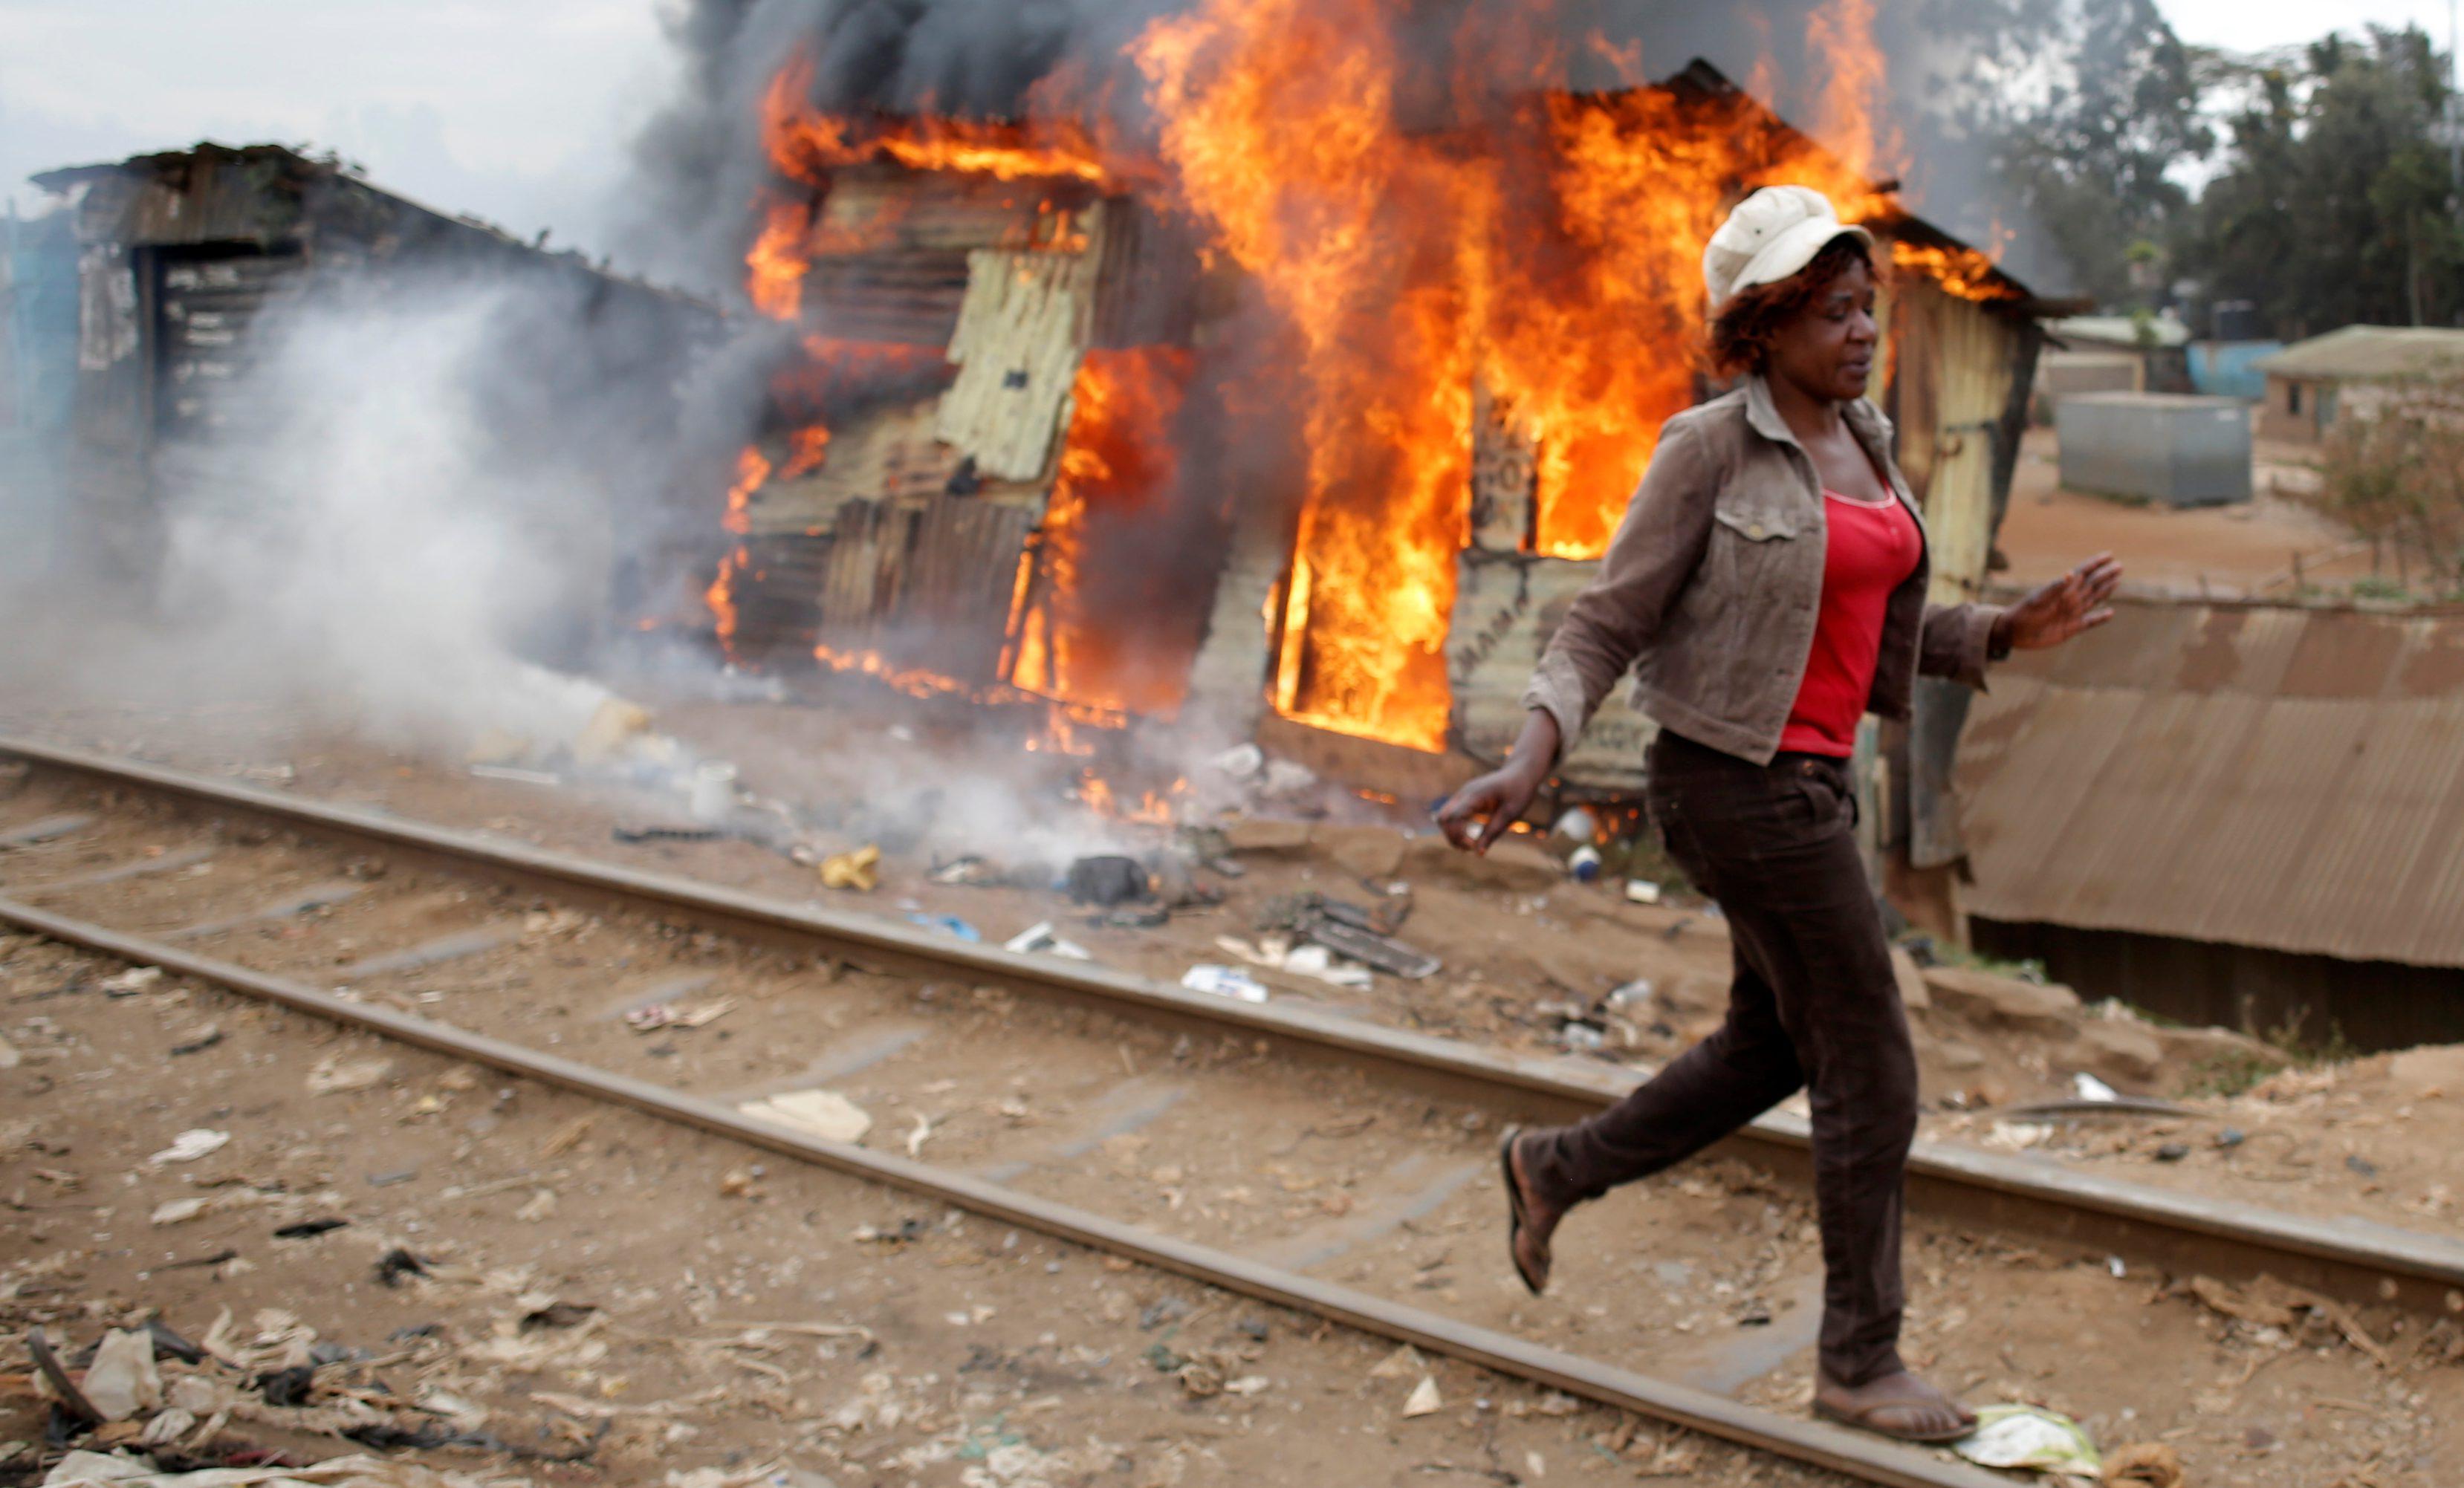 A woman walks past a burned shack, in Kibera slum, in Nairobi, Kenya.